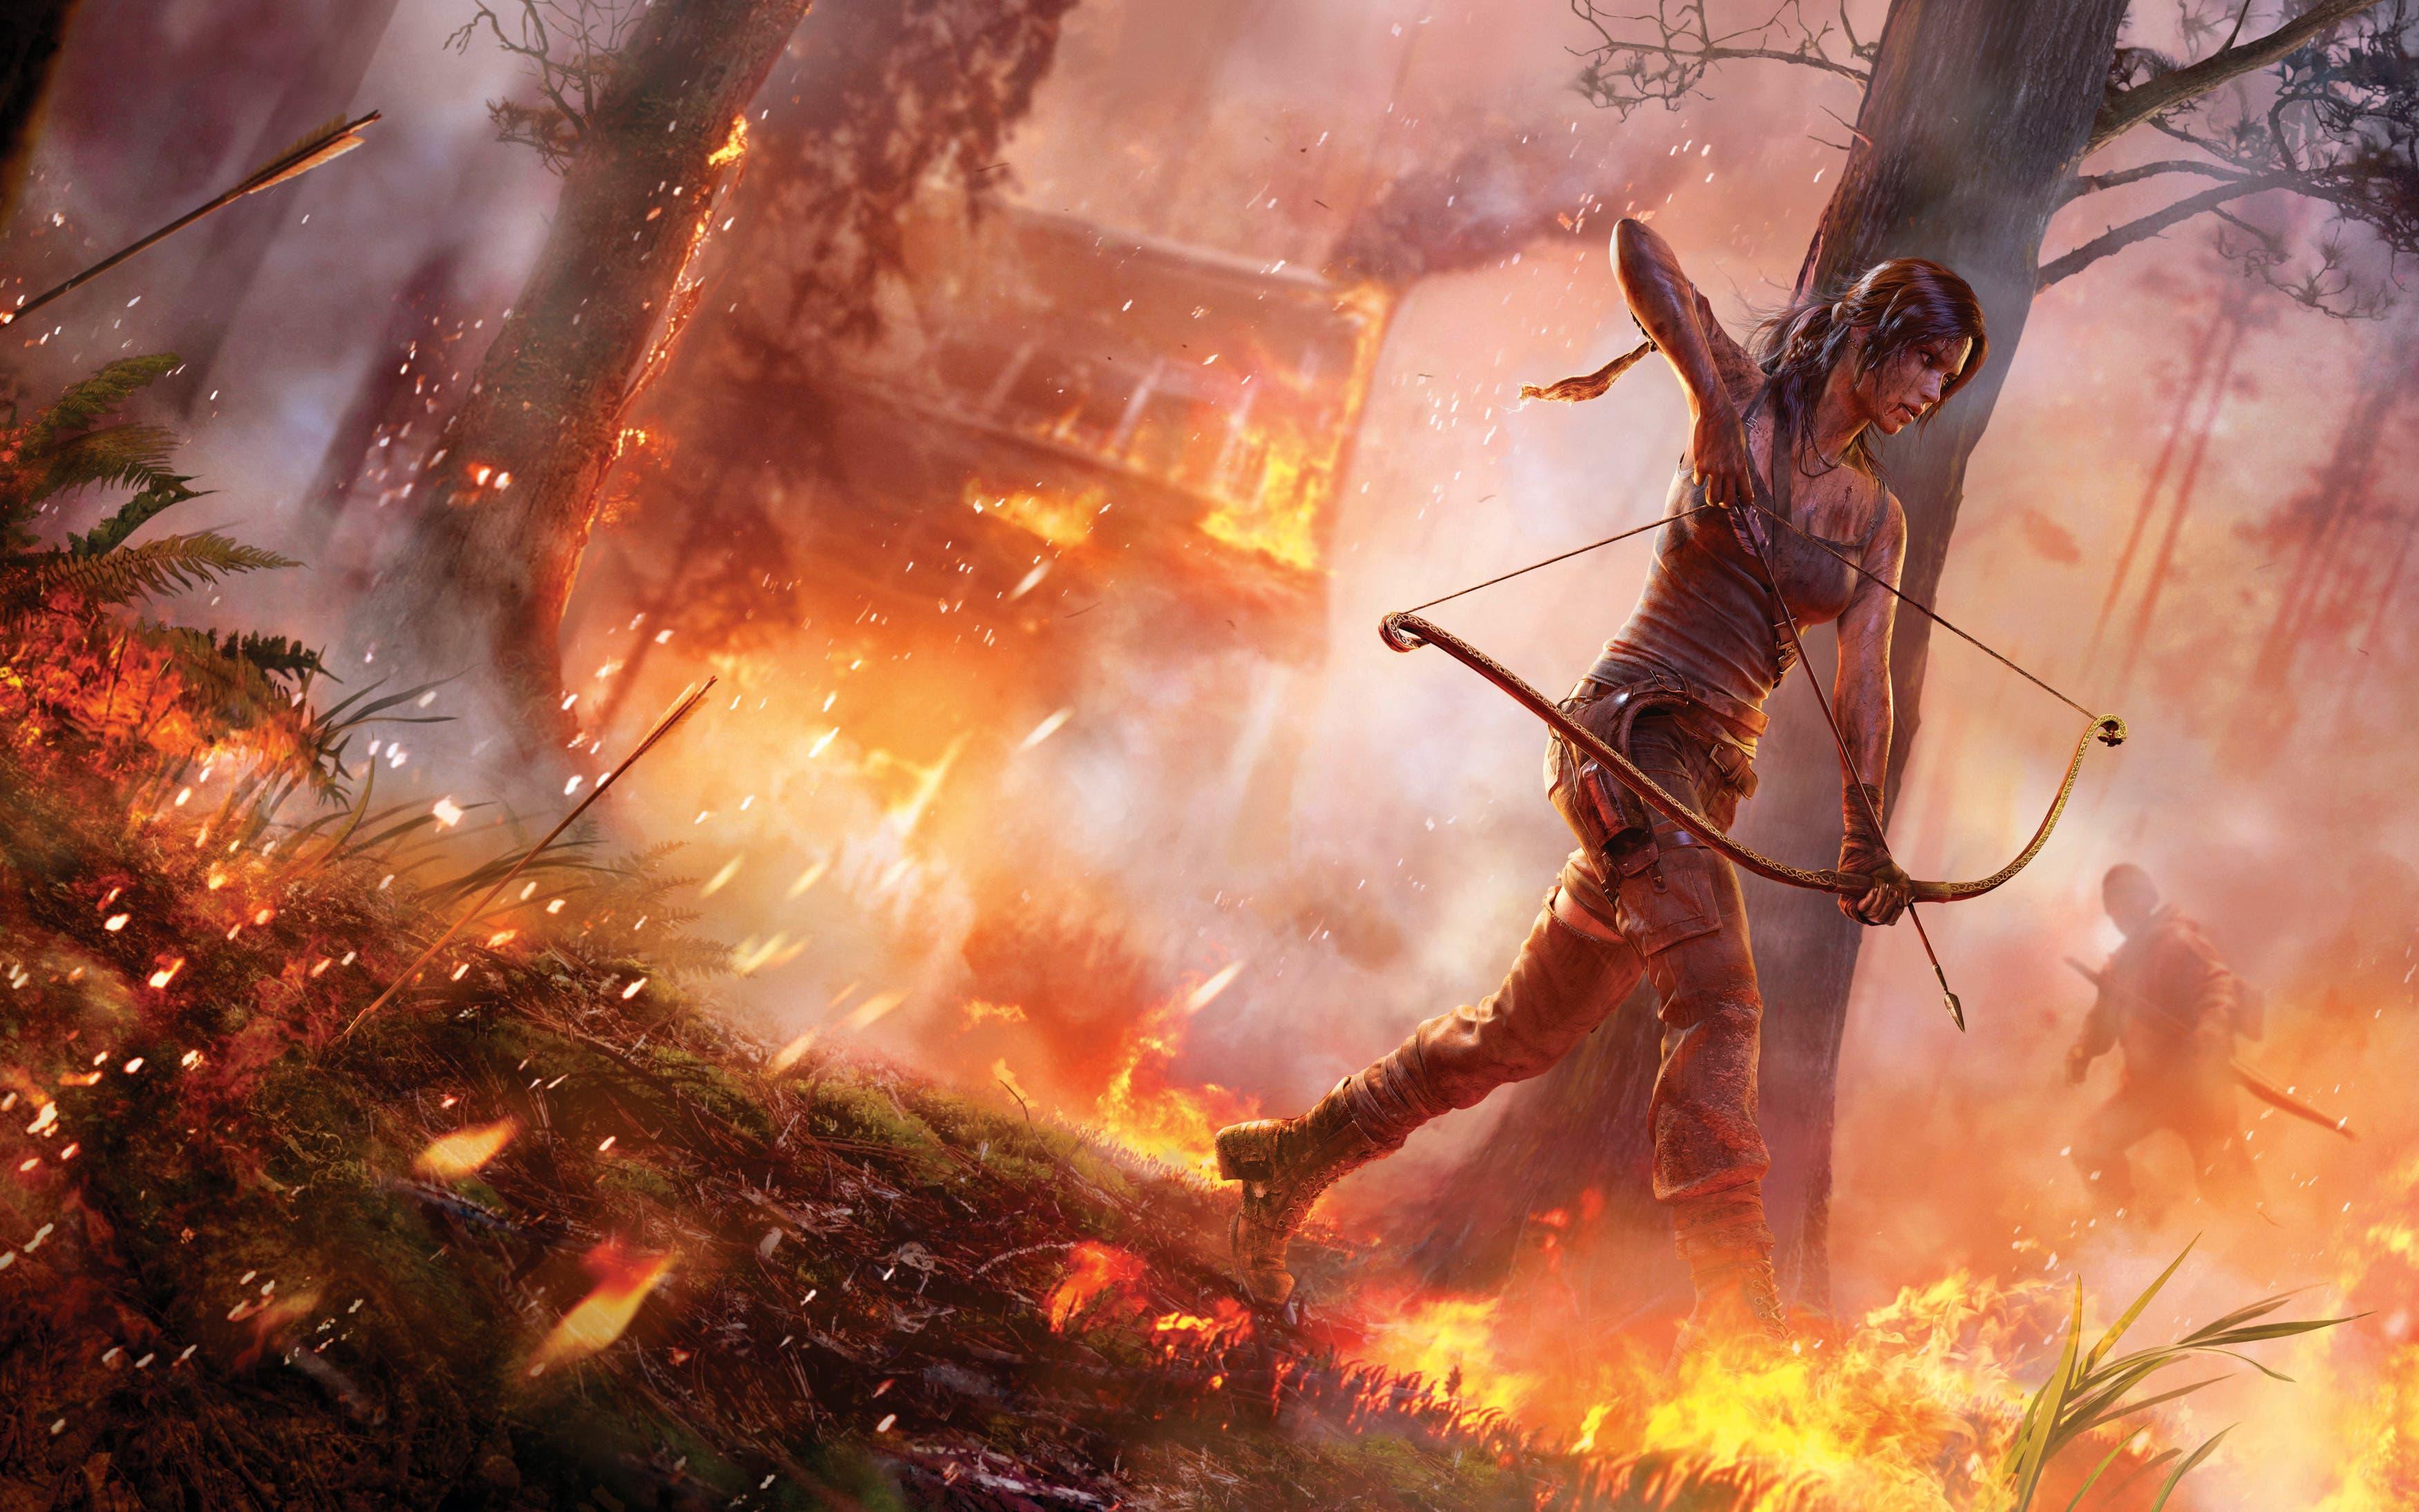 tomb raider 2013 game wide